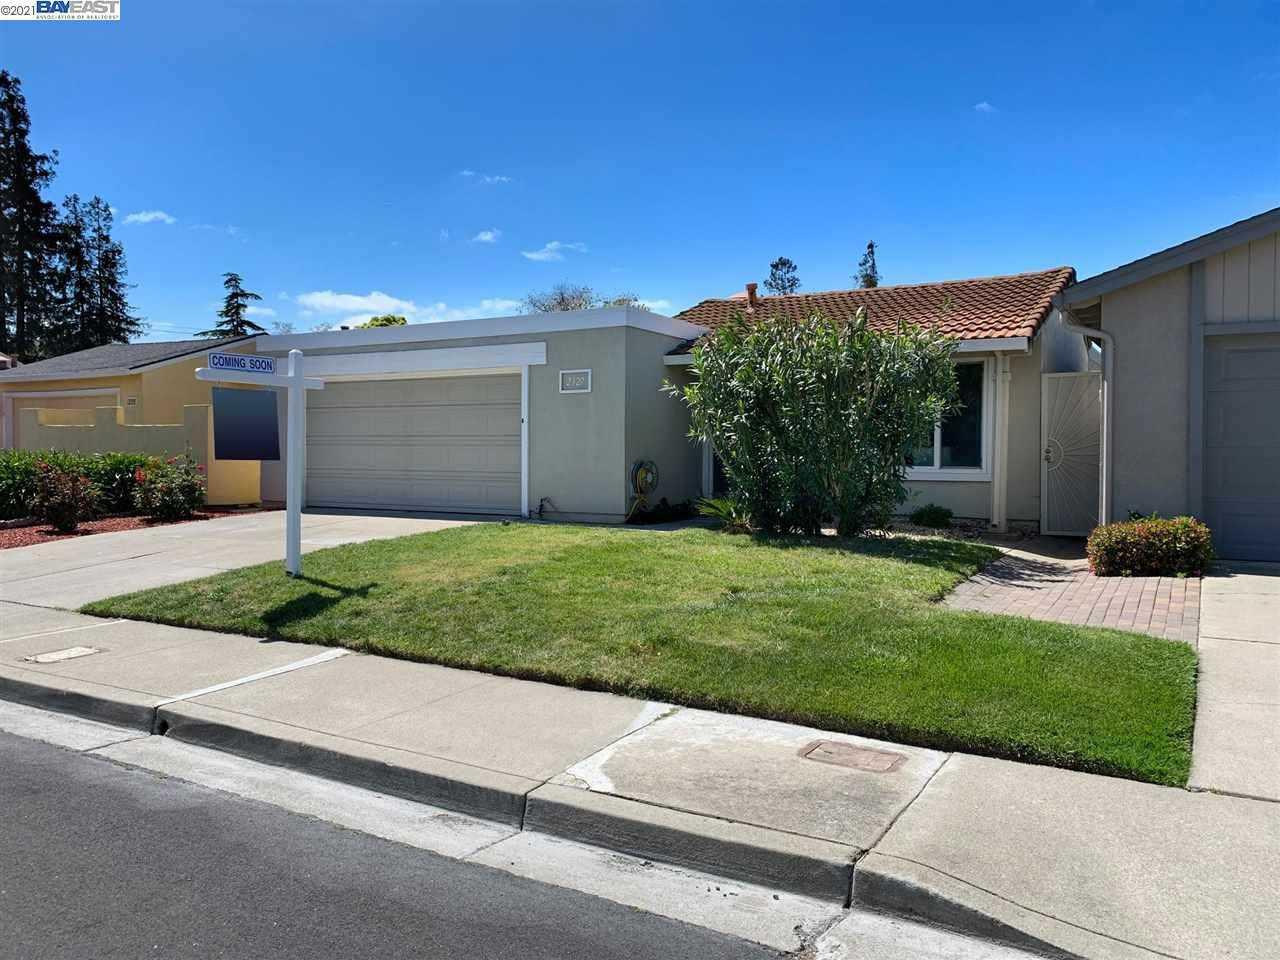 $1,089,900 - 3Br/2Ba -  for Sale in Goldcrest, Pleasanton